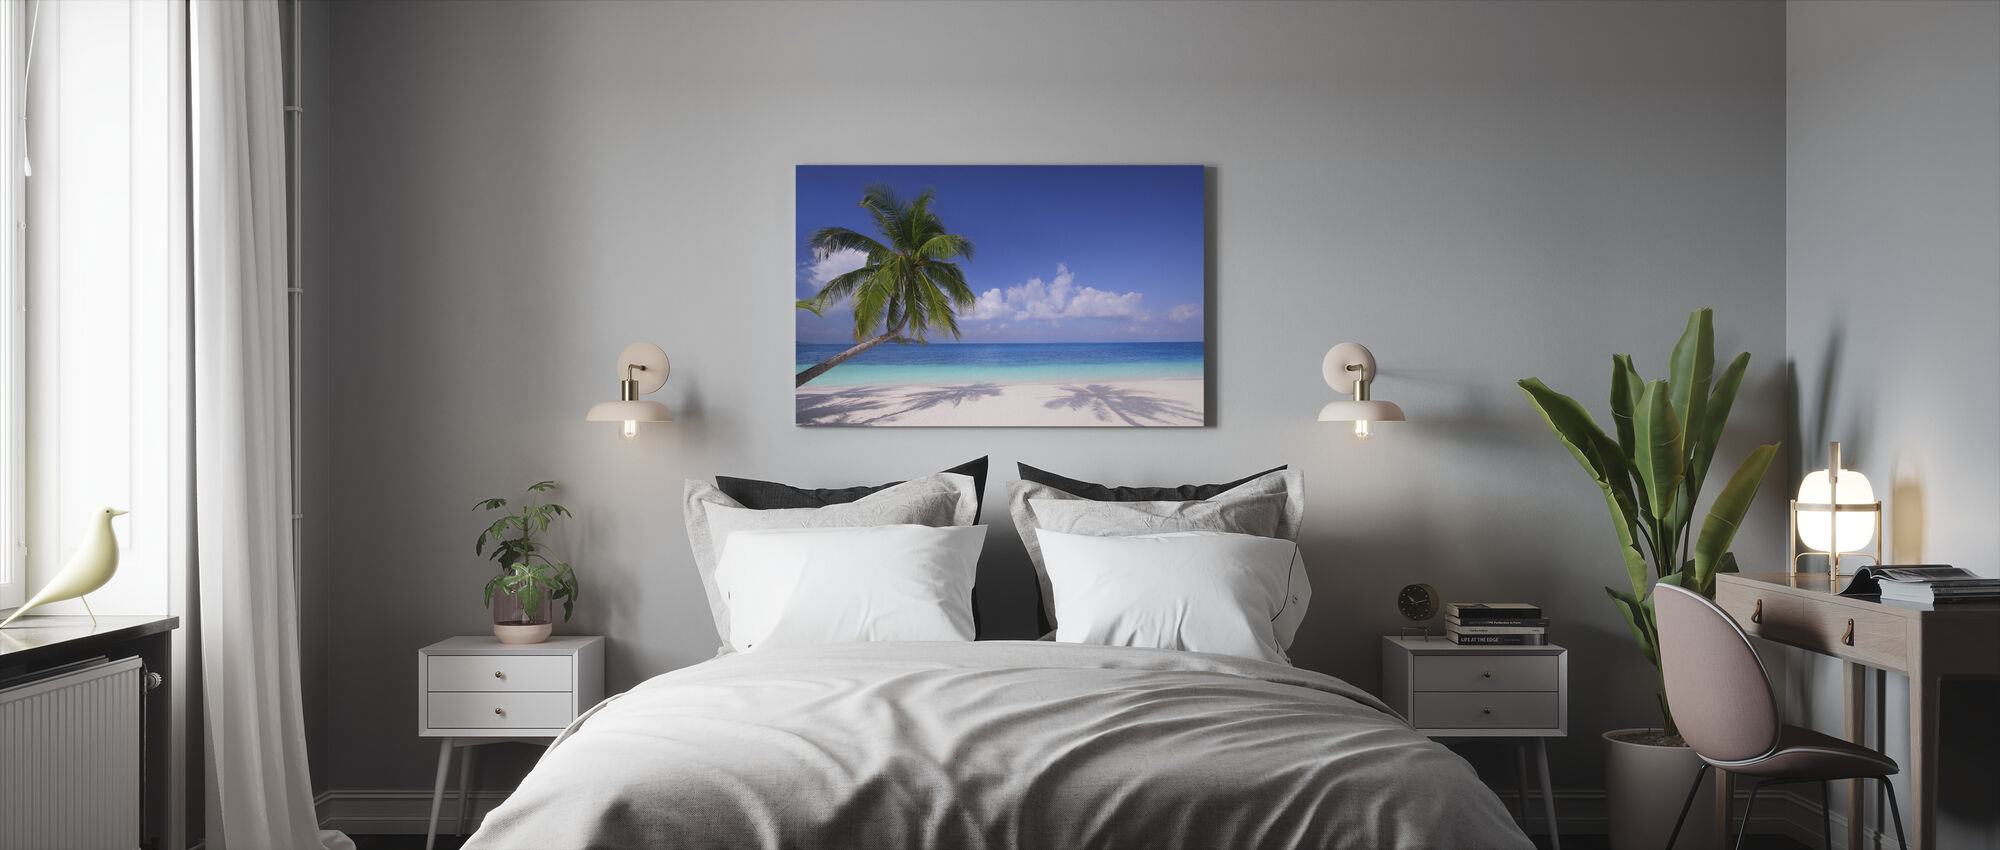 Island Paradise - Lerretsbilde - Soverom